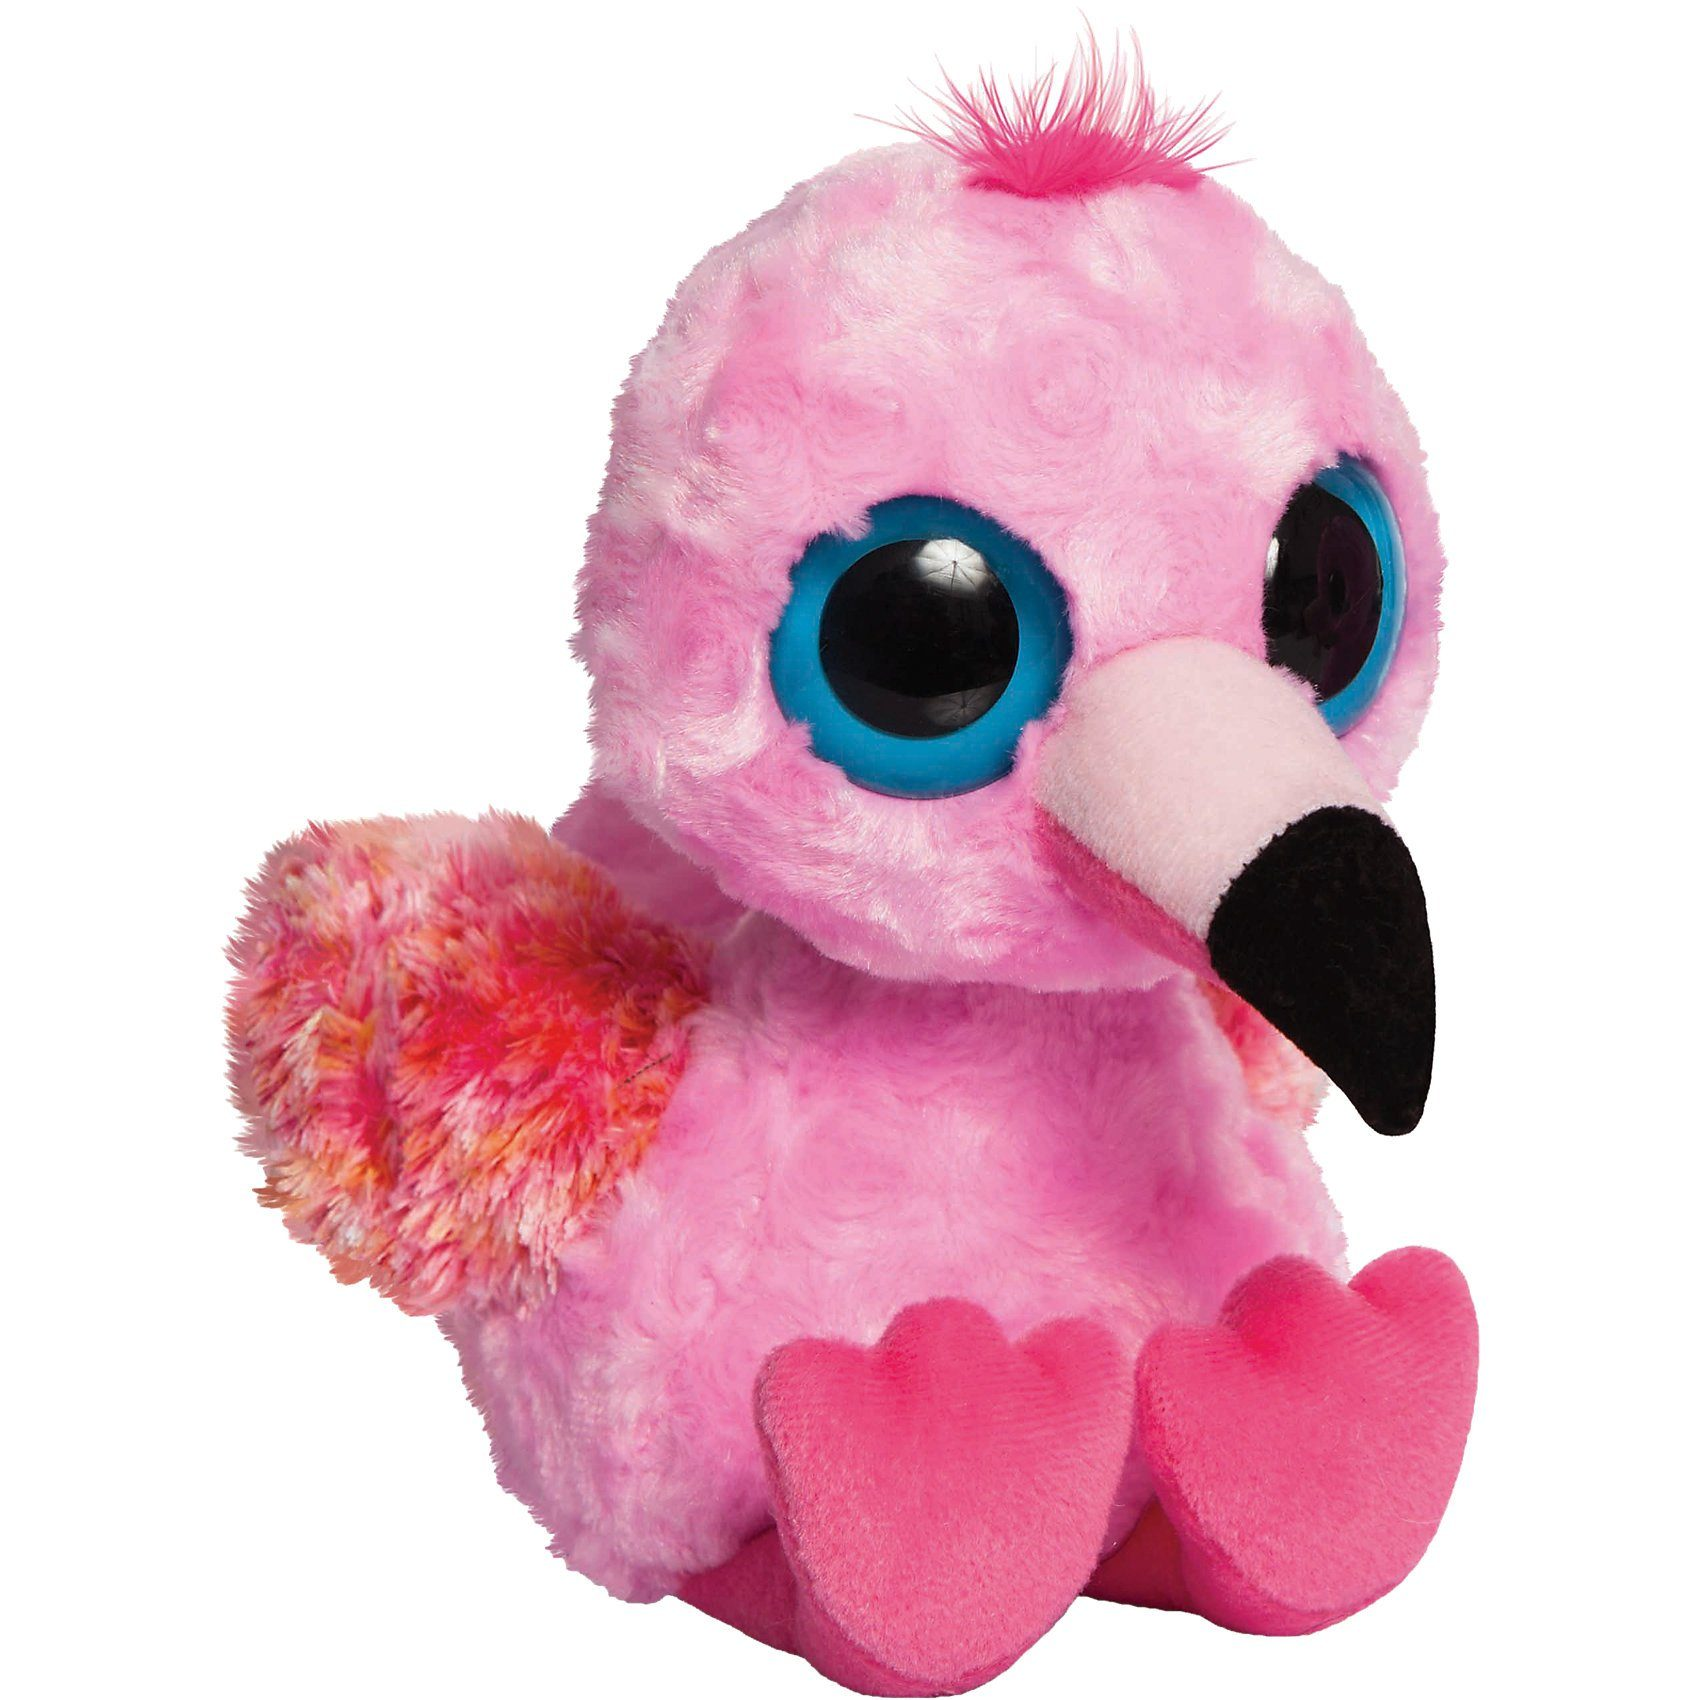 YooHoo & Friends Pinkee Flamingo, 20 cm